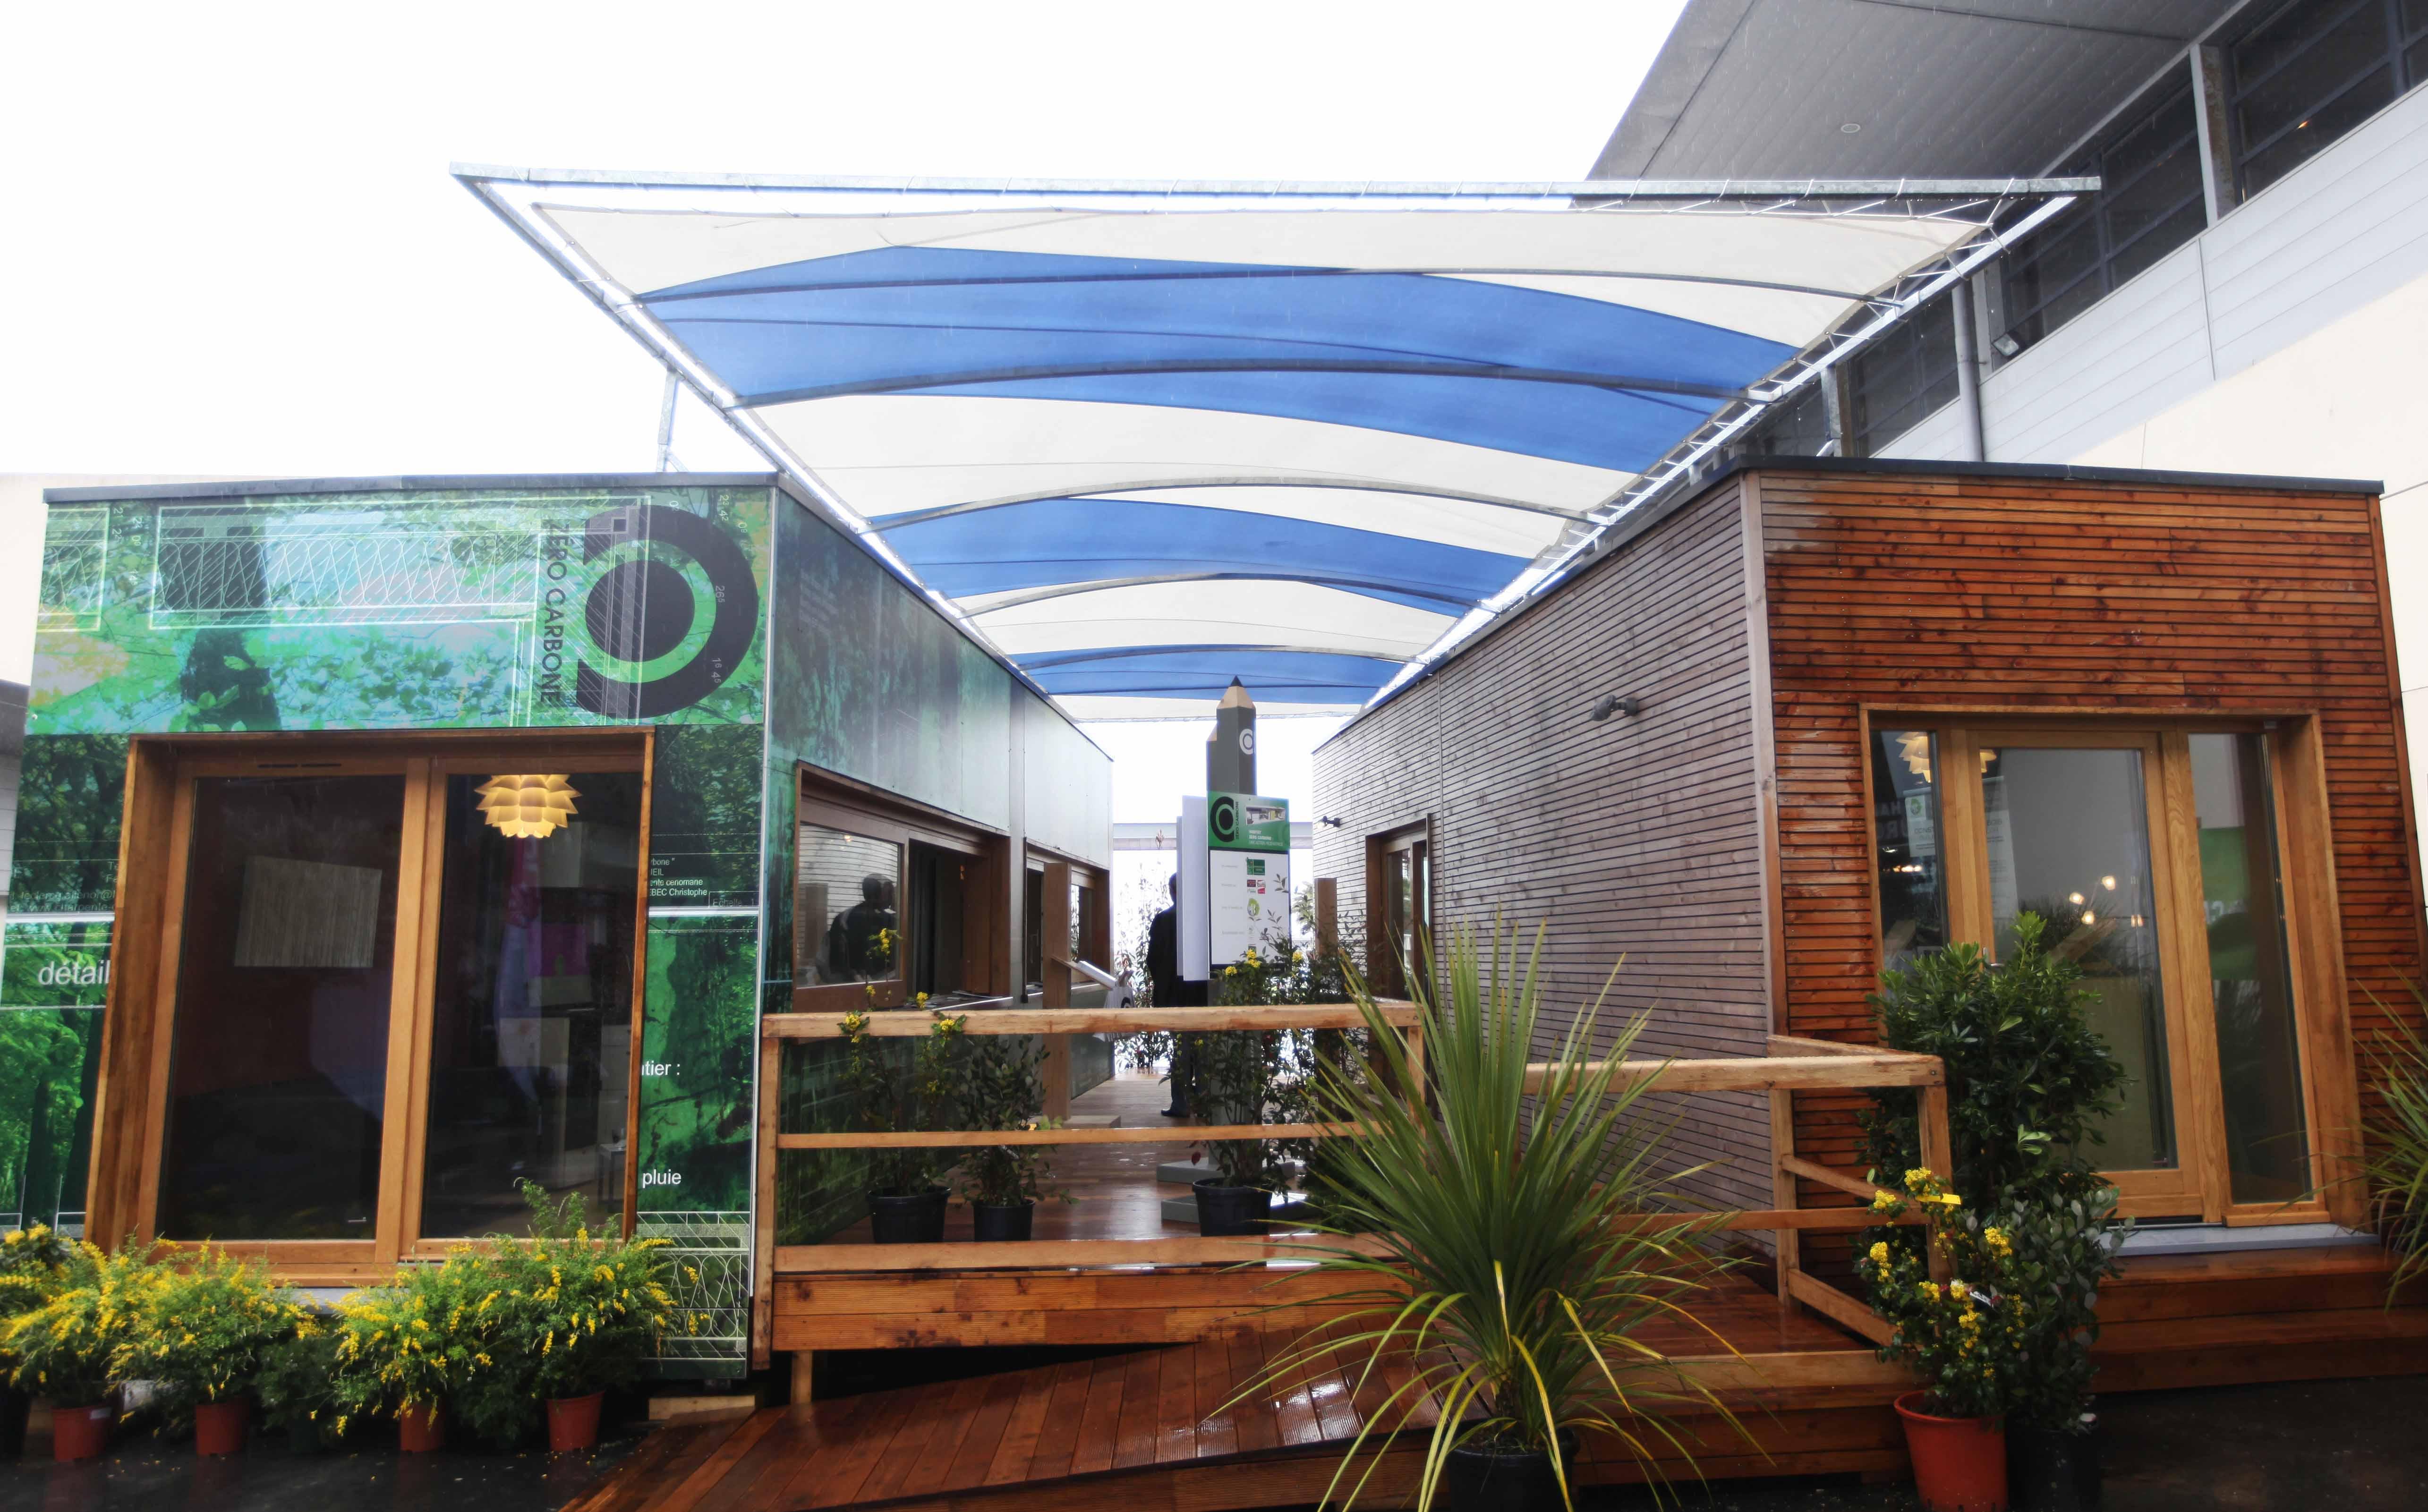 Salon habitat sud montpellier nk design studio - Salon de l habitat montpellier ...